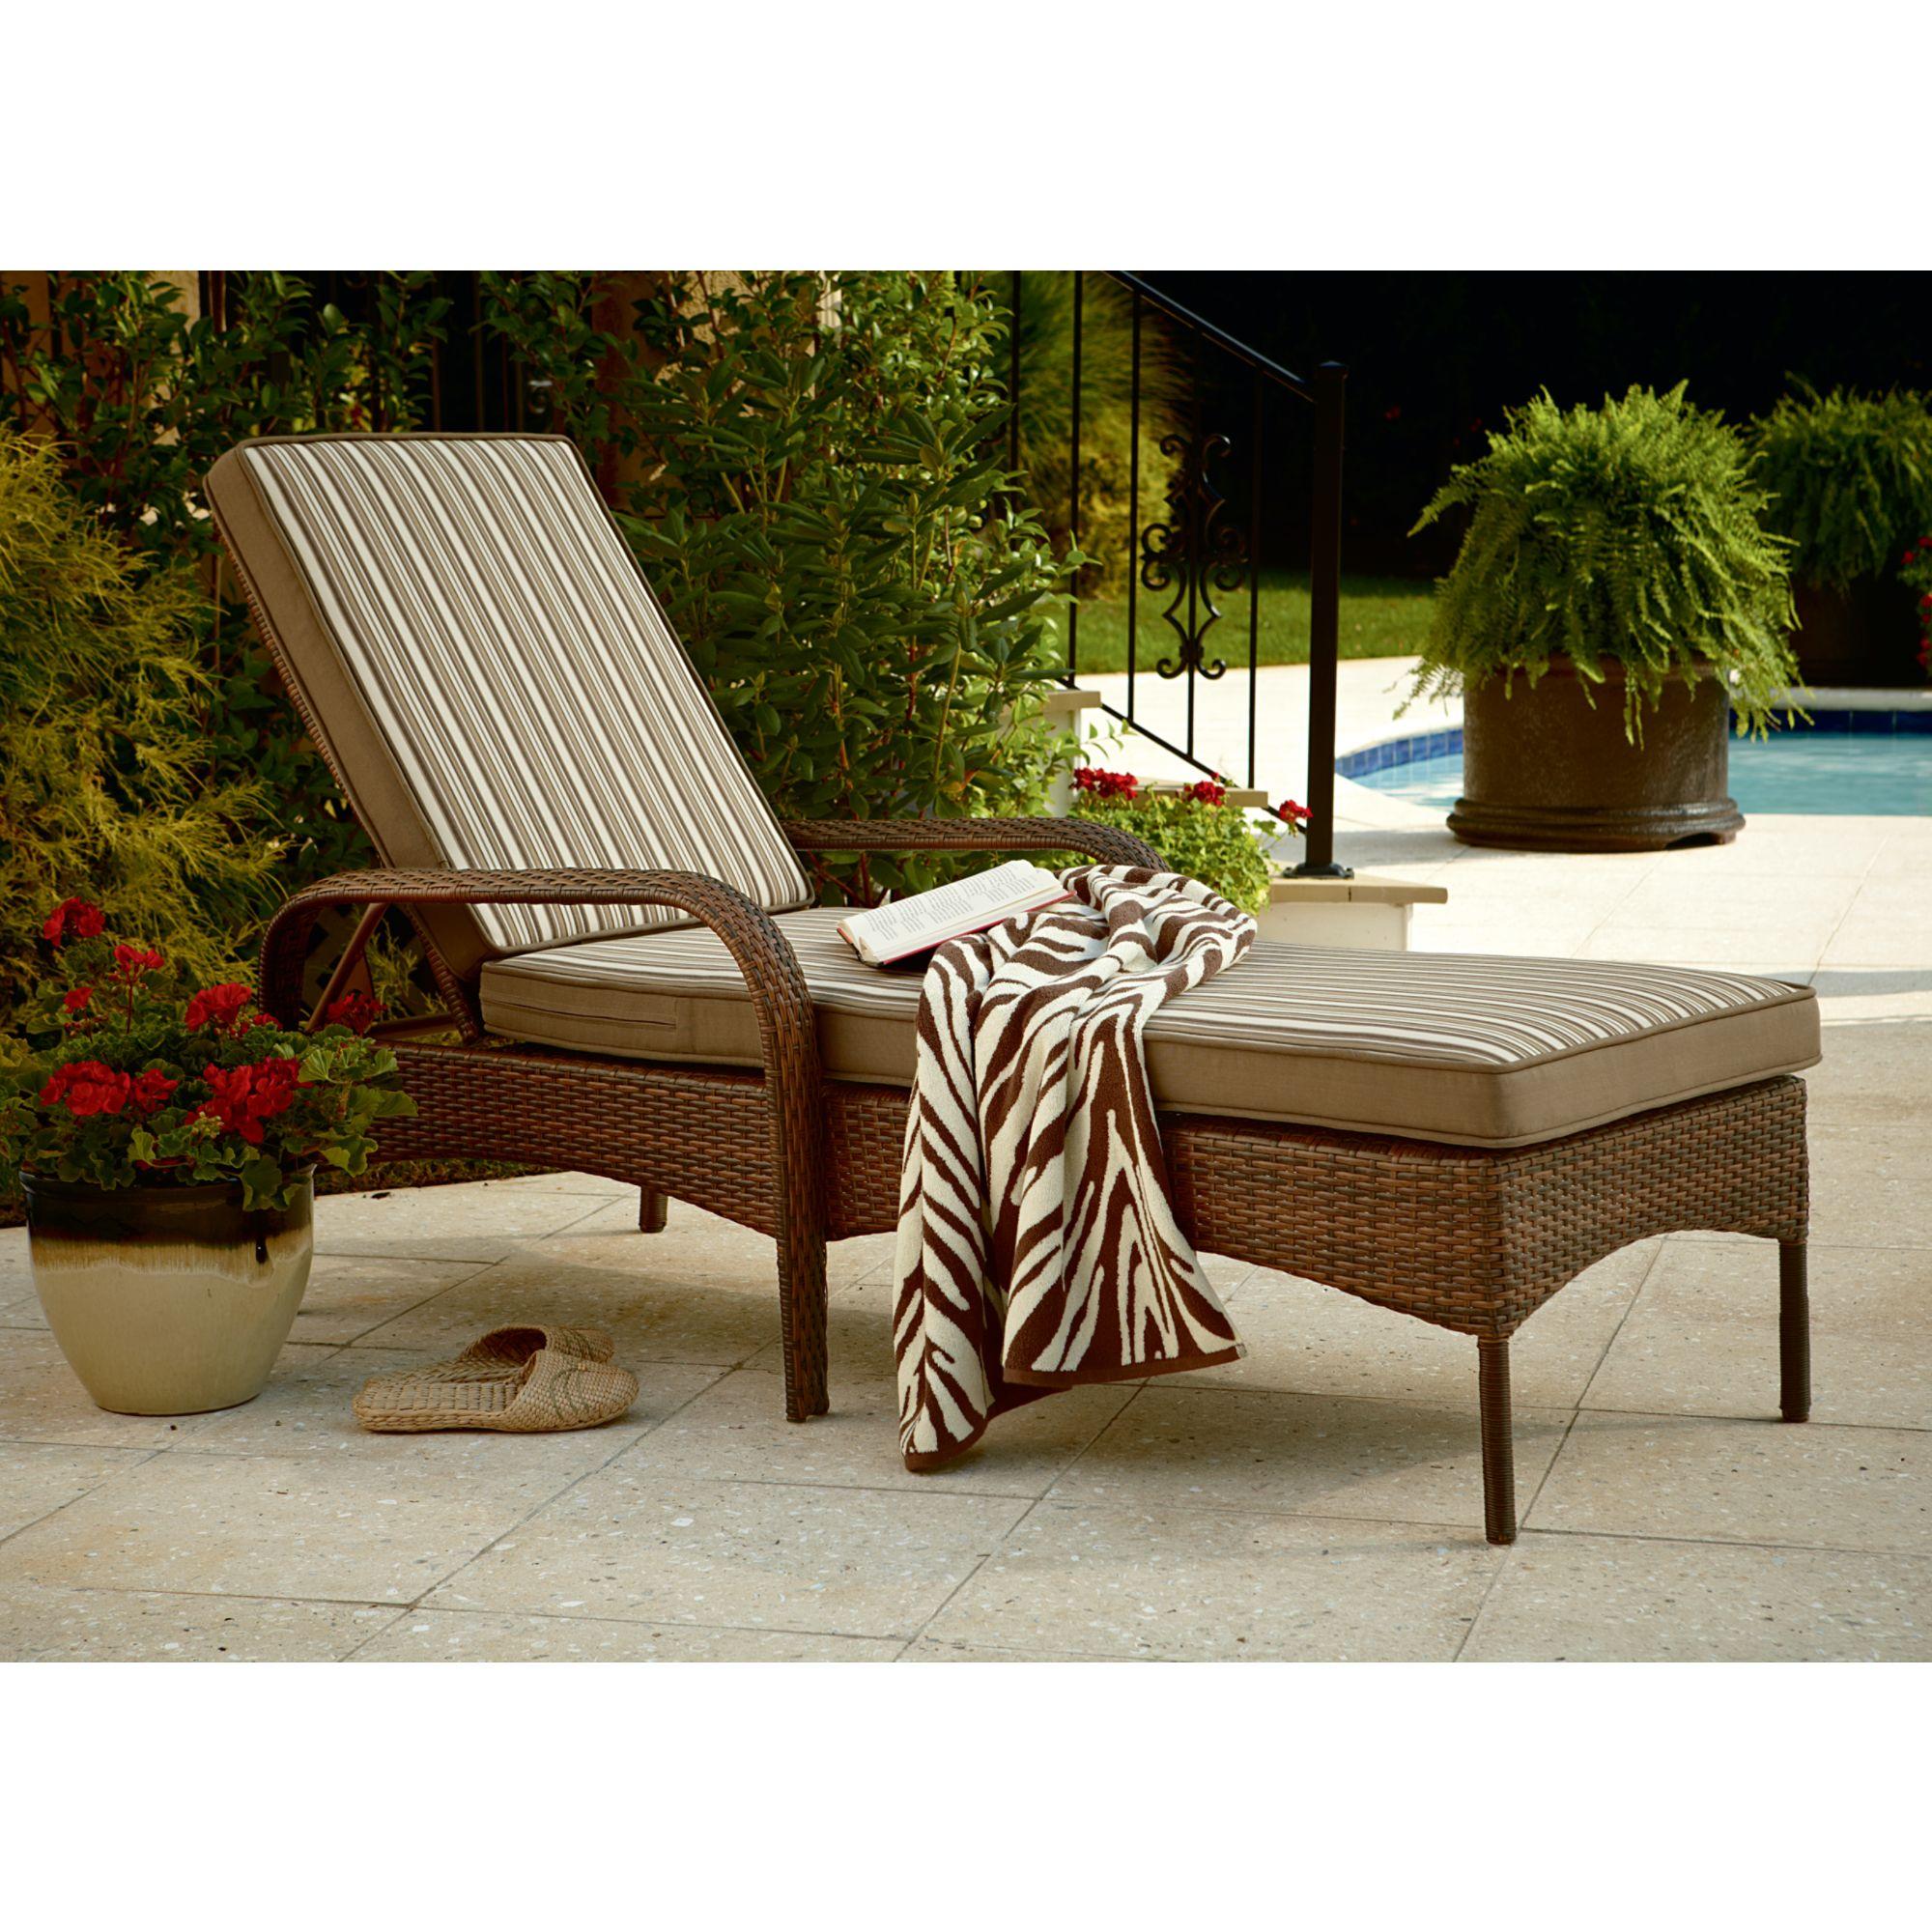 Awesome Sears Wicker Patio Furniture | Sears Patio Furniture Replacement Cushions | Sears  Patio Furniture